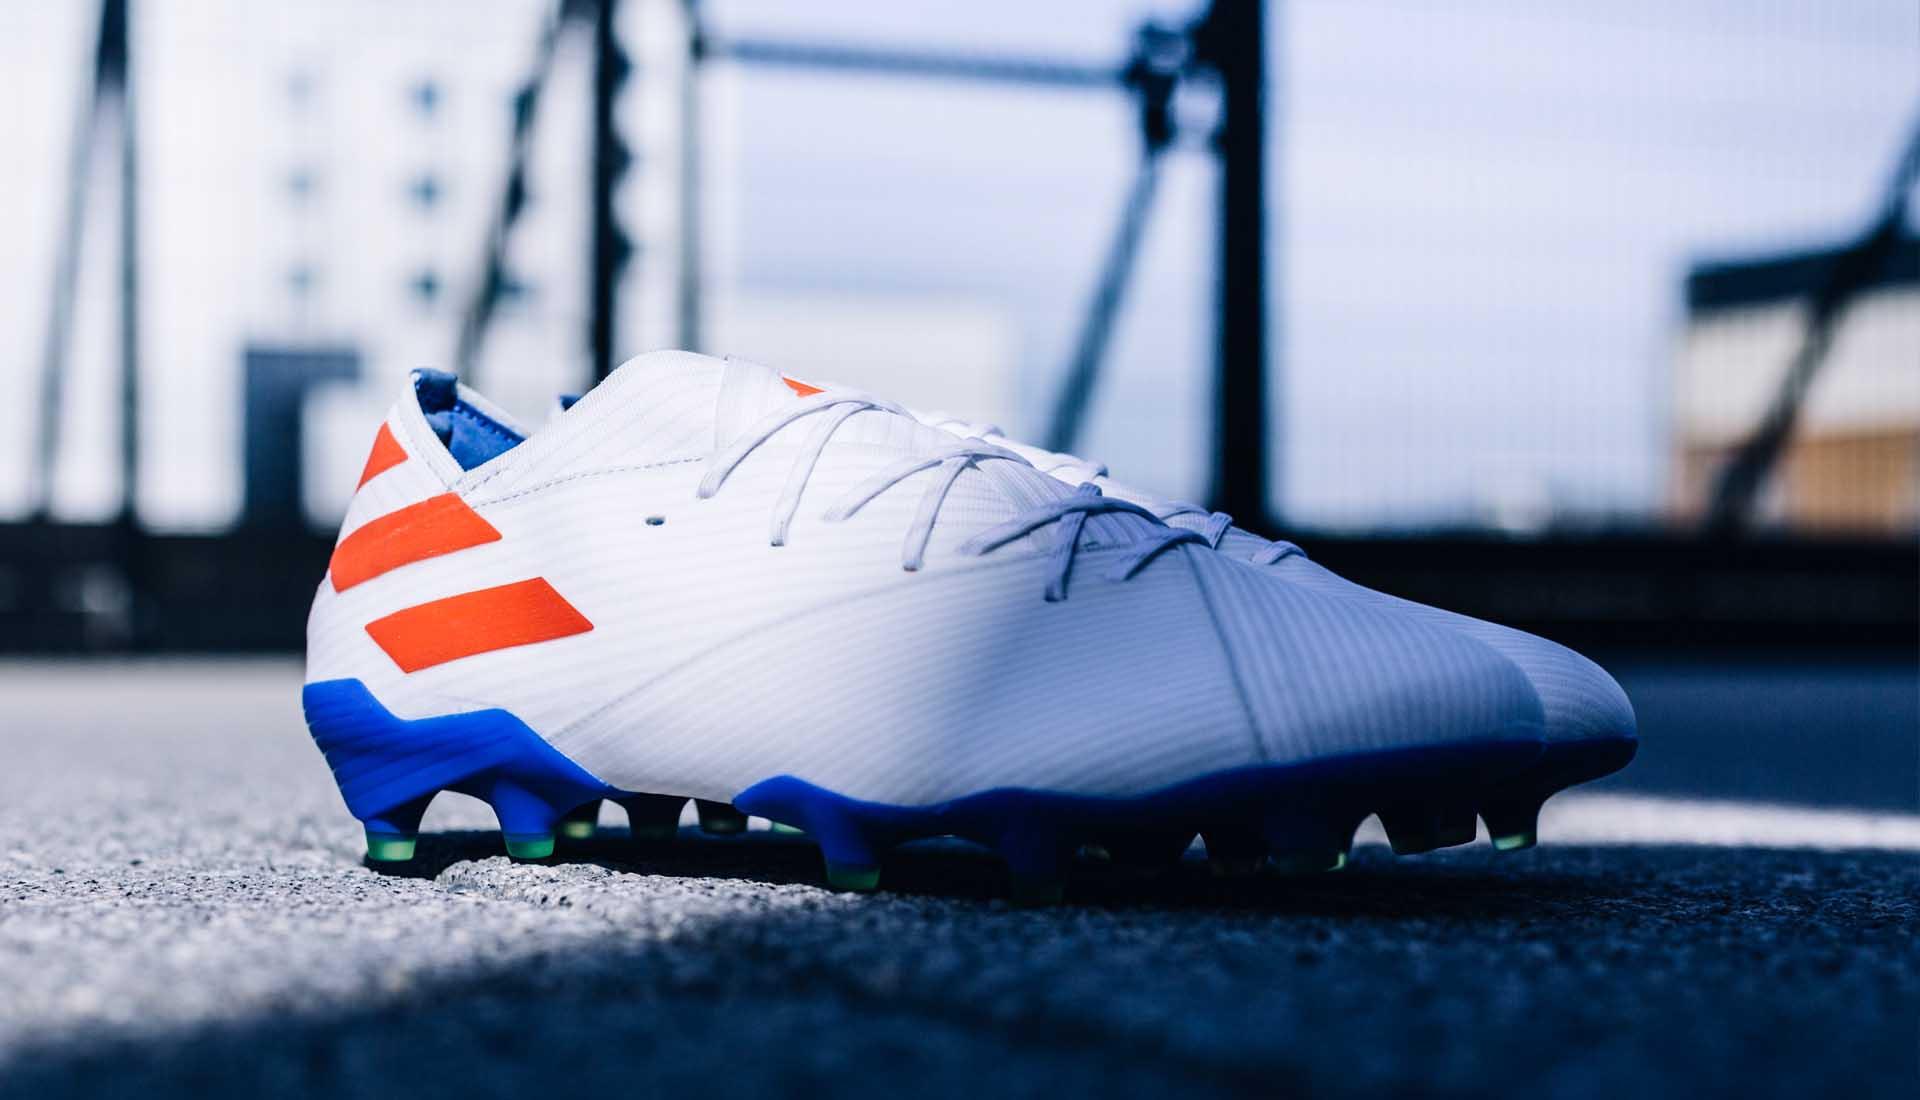 Adidas 302 Redirect Nemeziz Messi 19.1